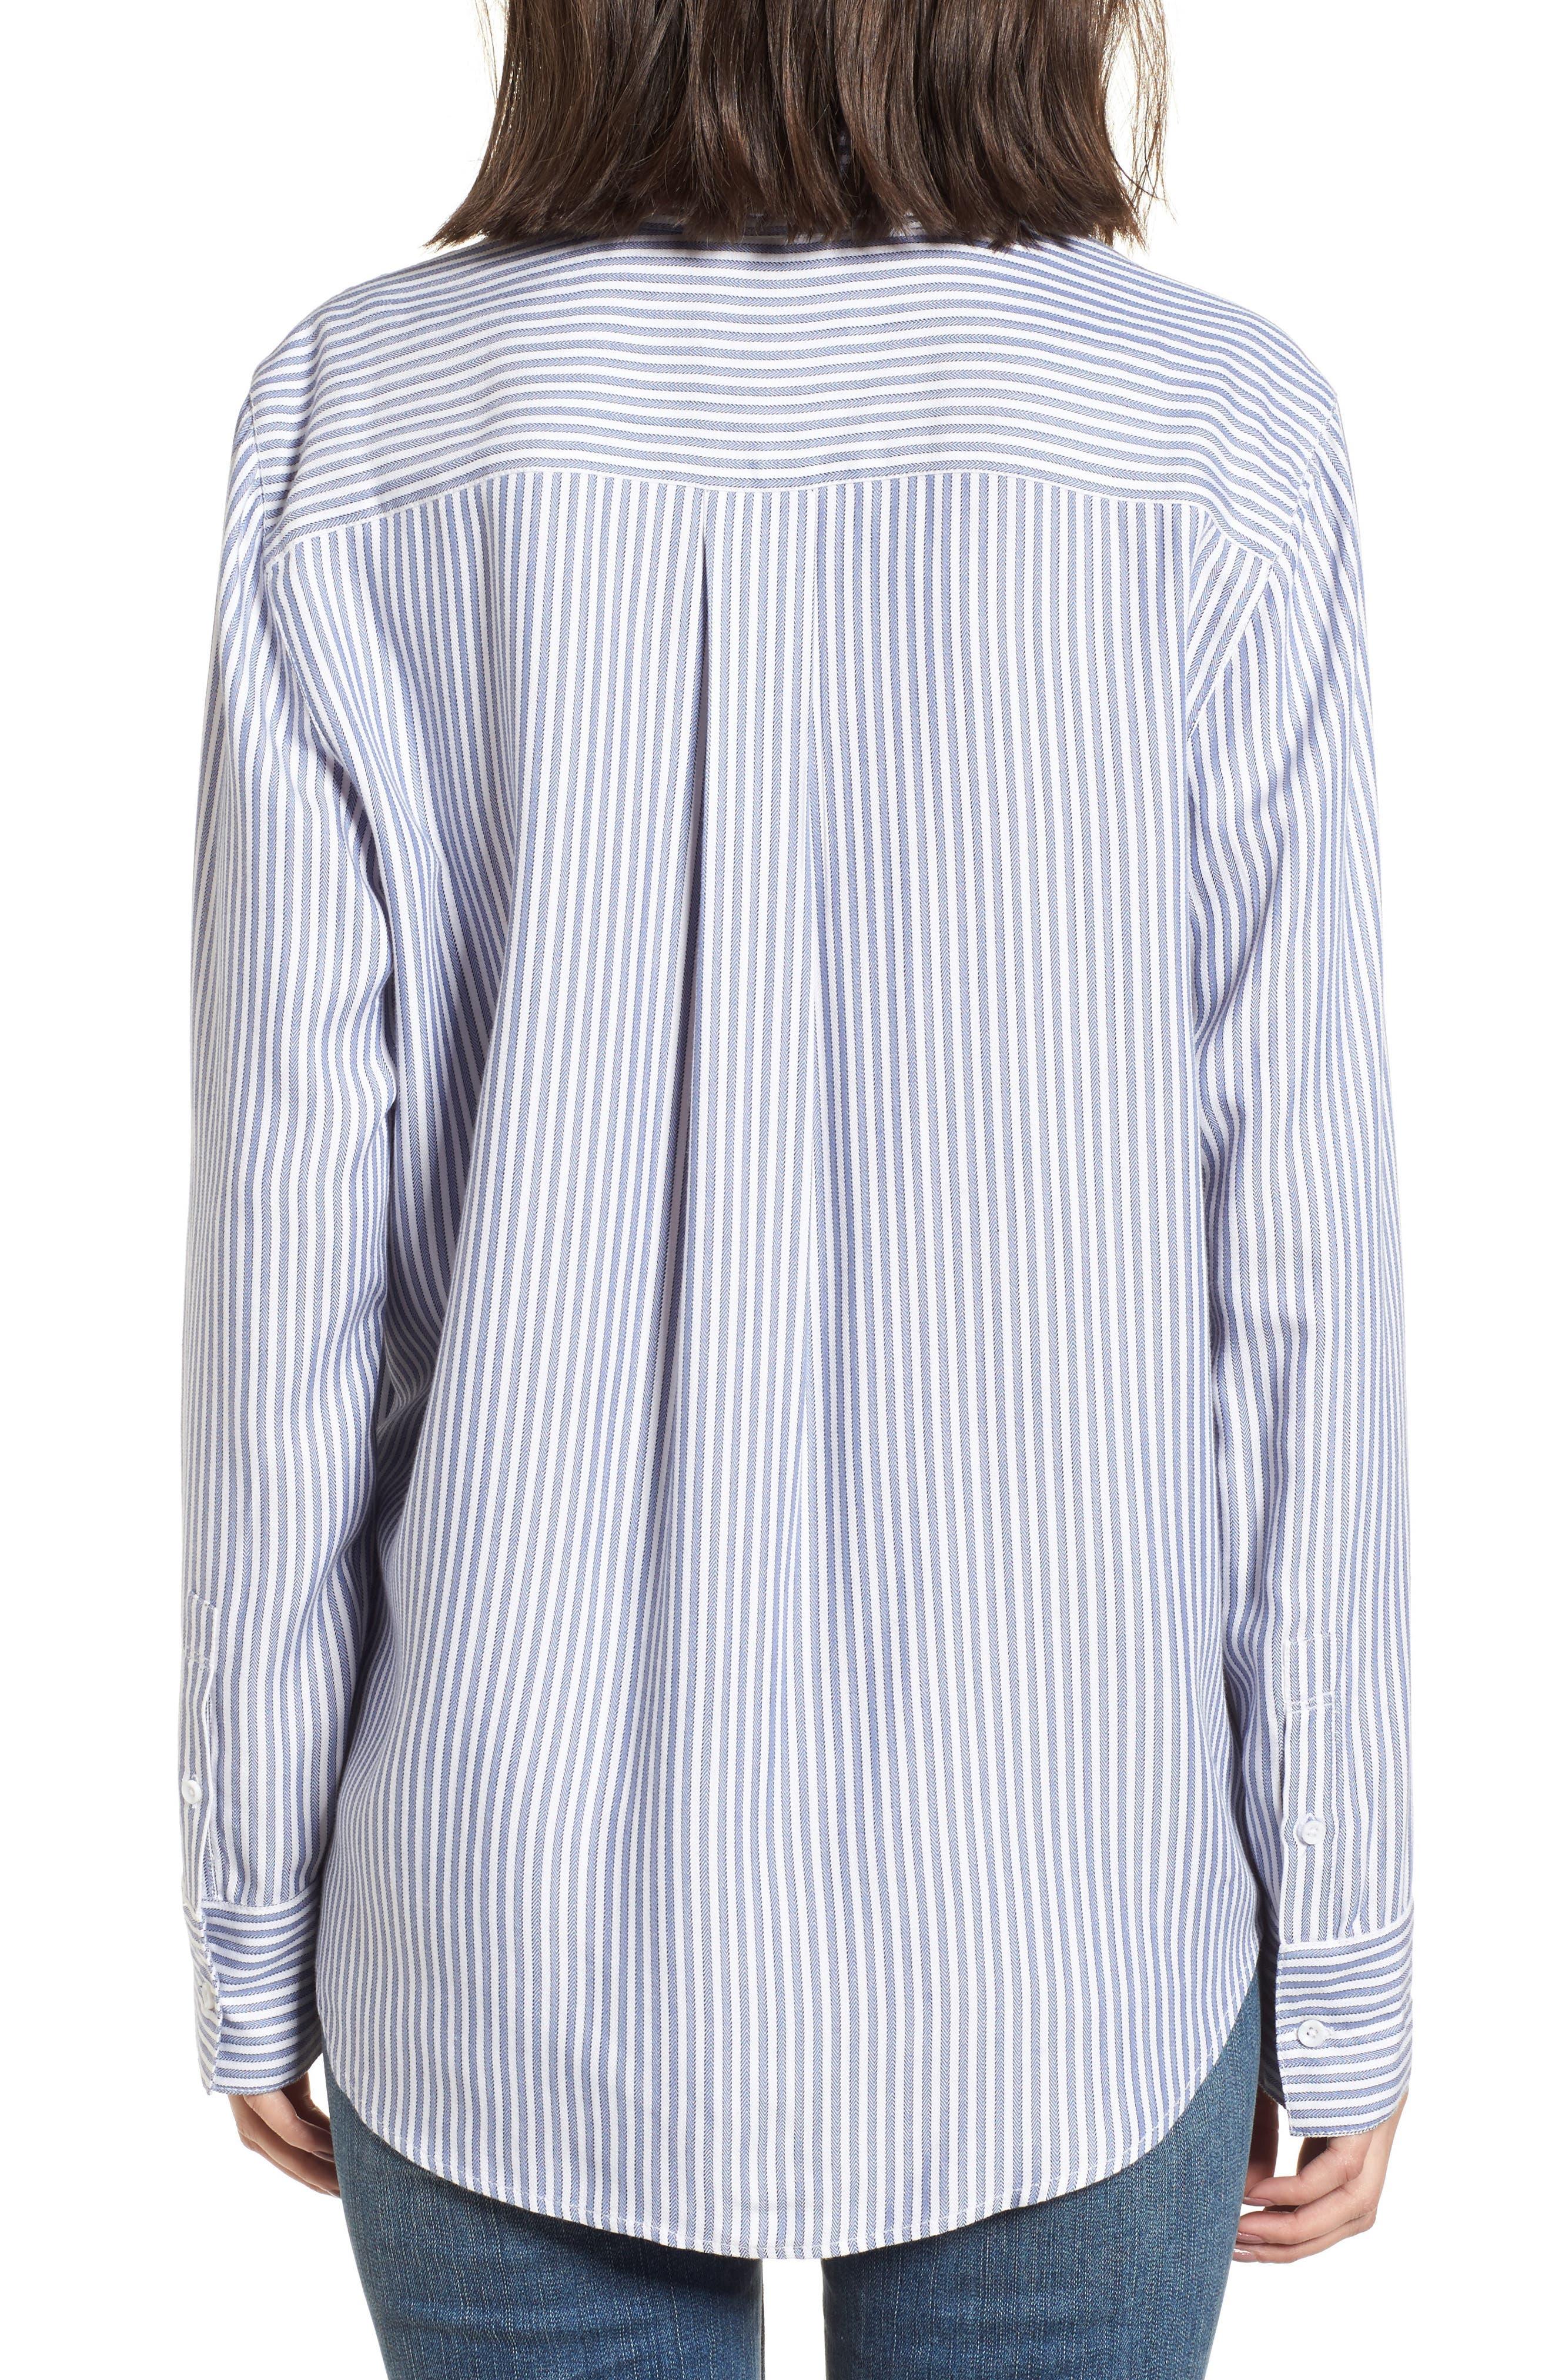 Stripe Ruffle Shirt,                             Alternate thumbnail 2, color,                             100